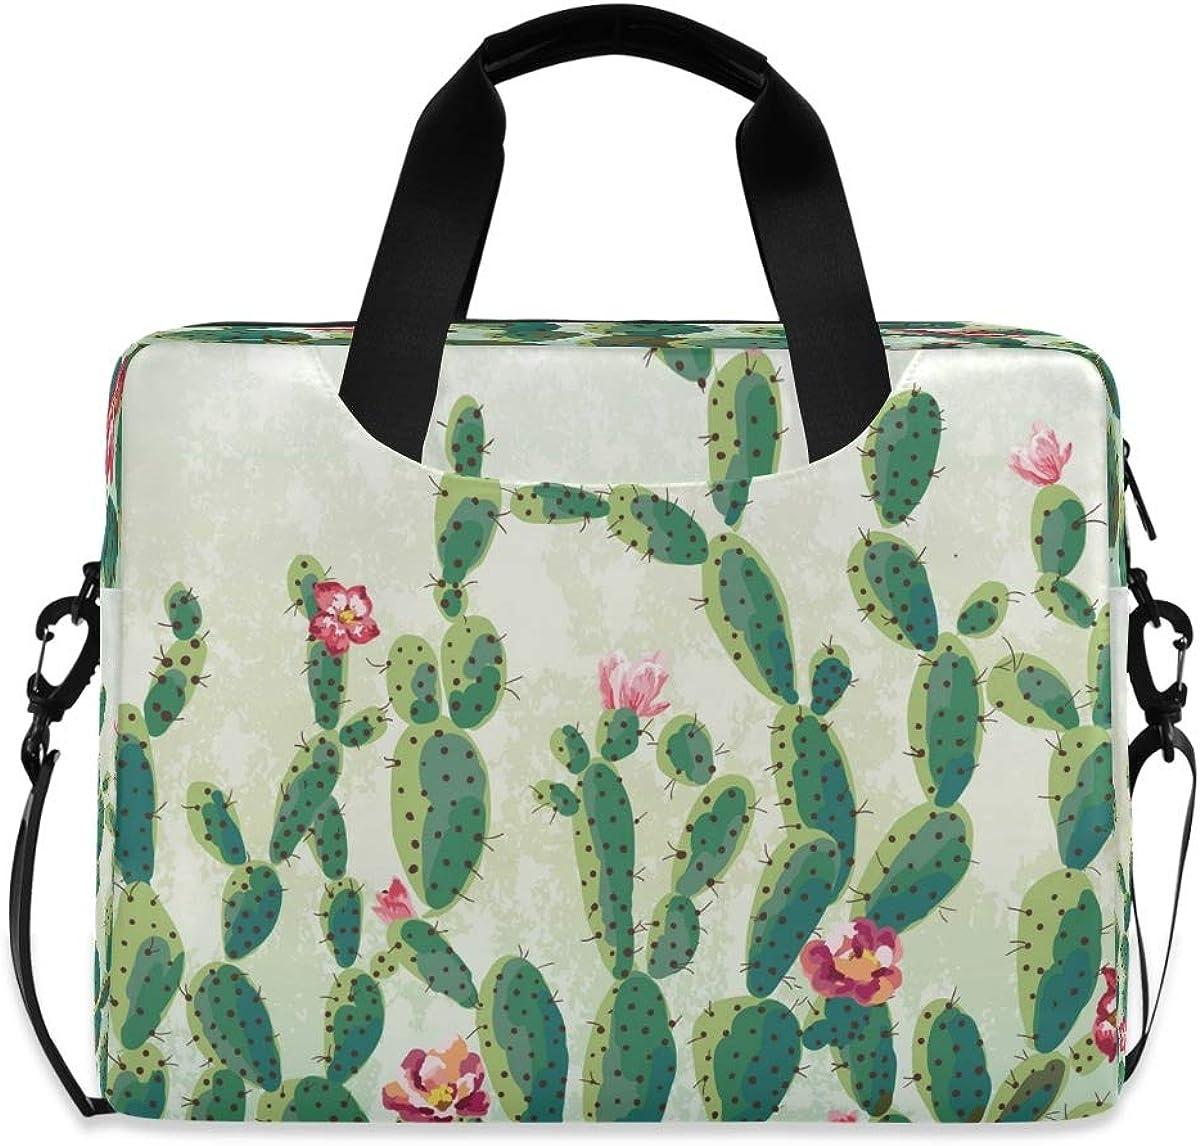 LELEGO Tropical Fees free Cactus Tree Flower Ba Laptop Shoulder Bag Seasonal Wrap Introduction